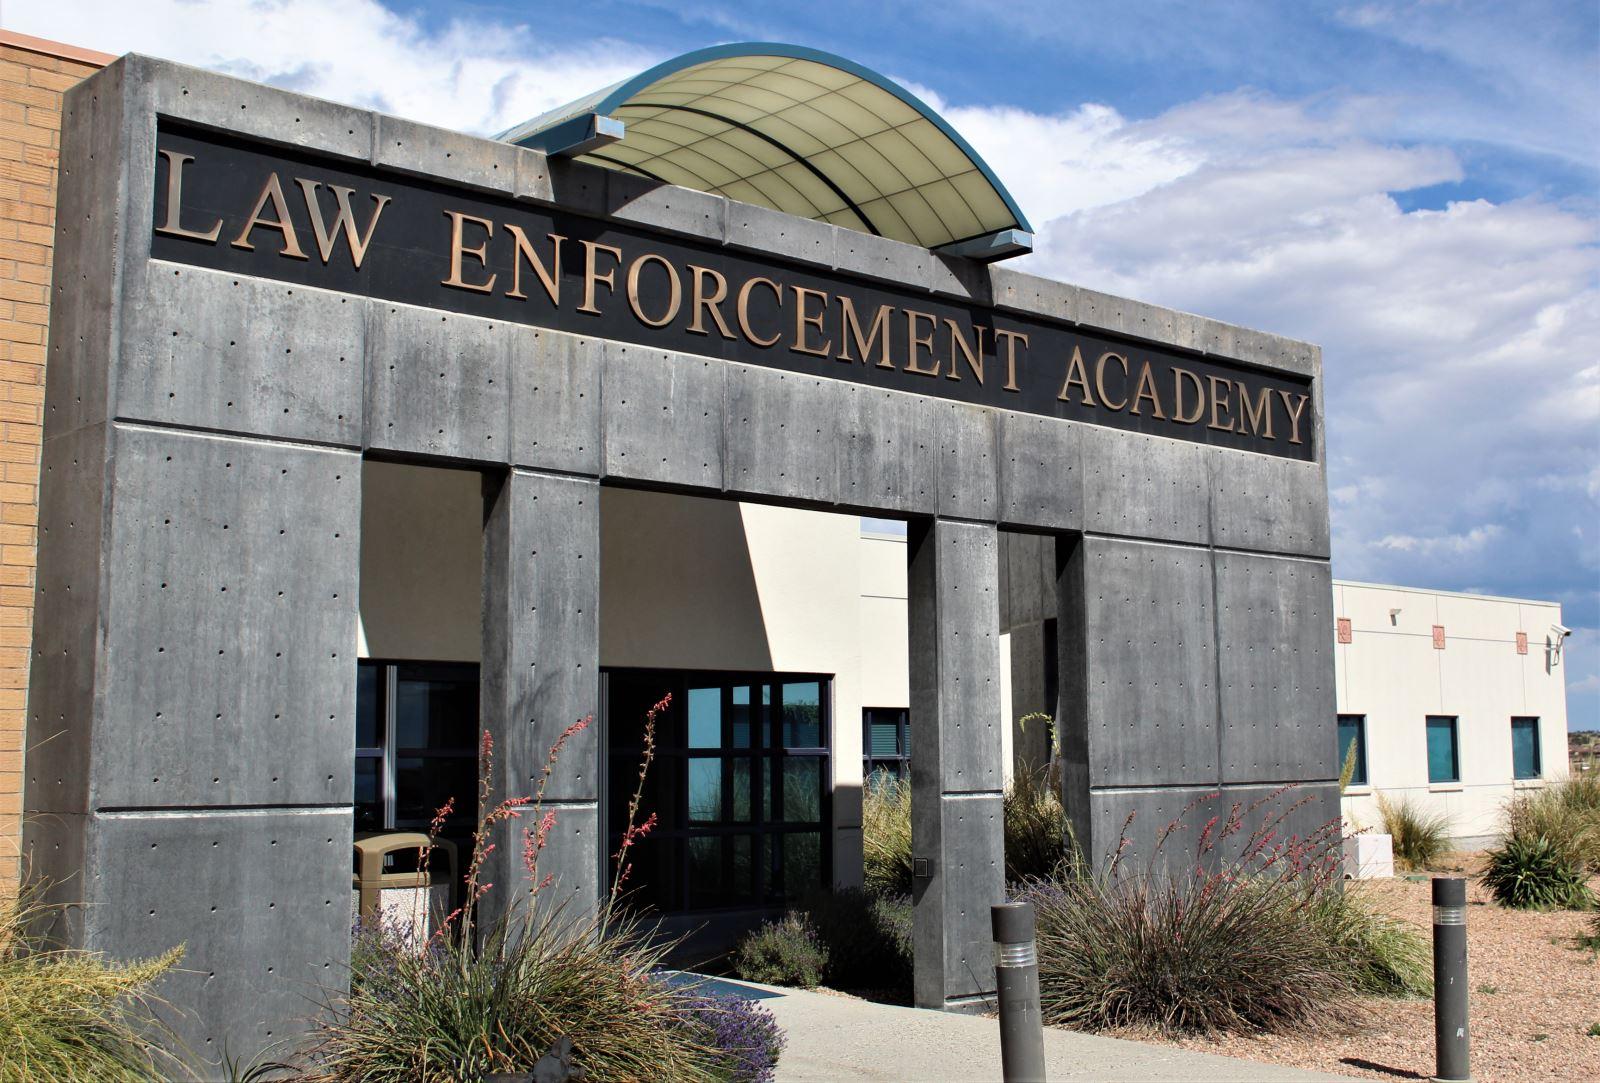 Law Enforcement Academy